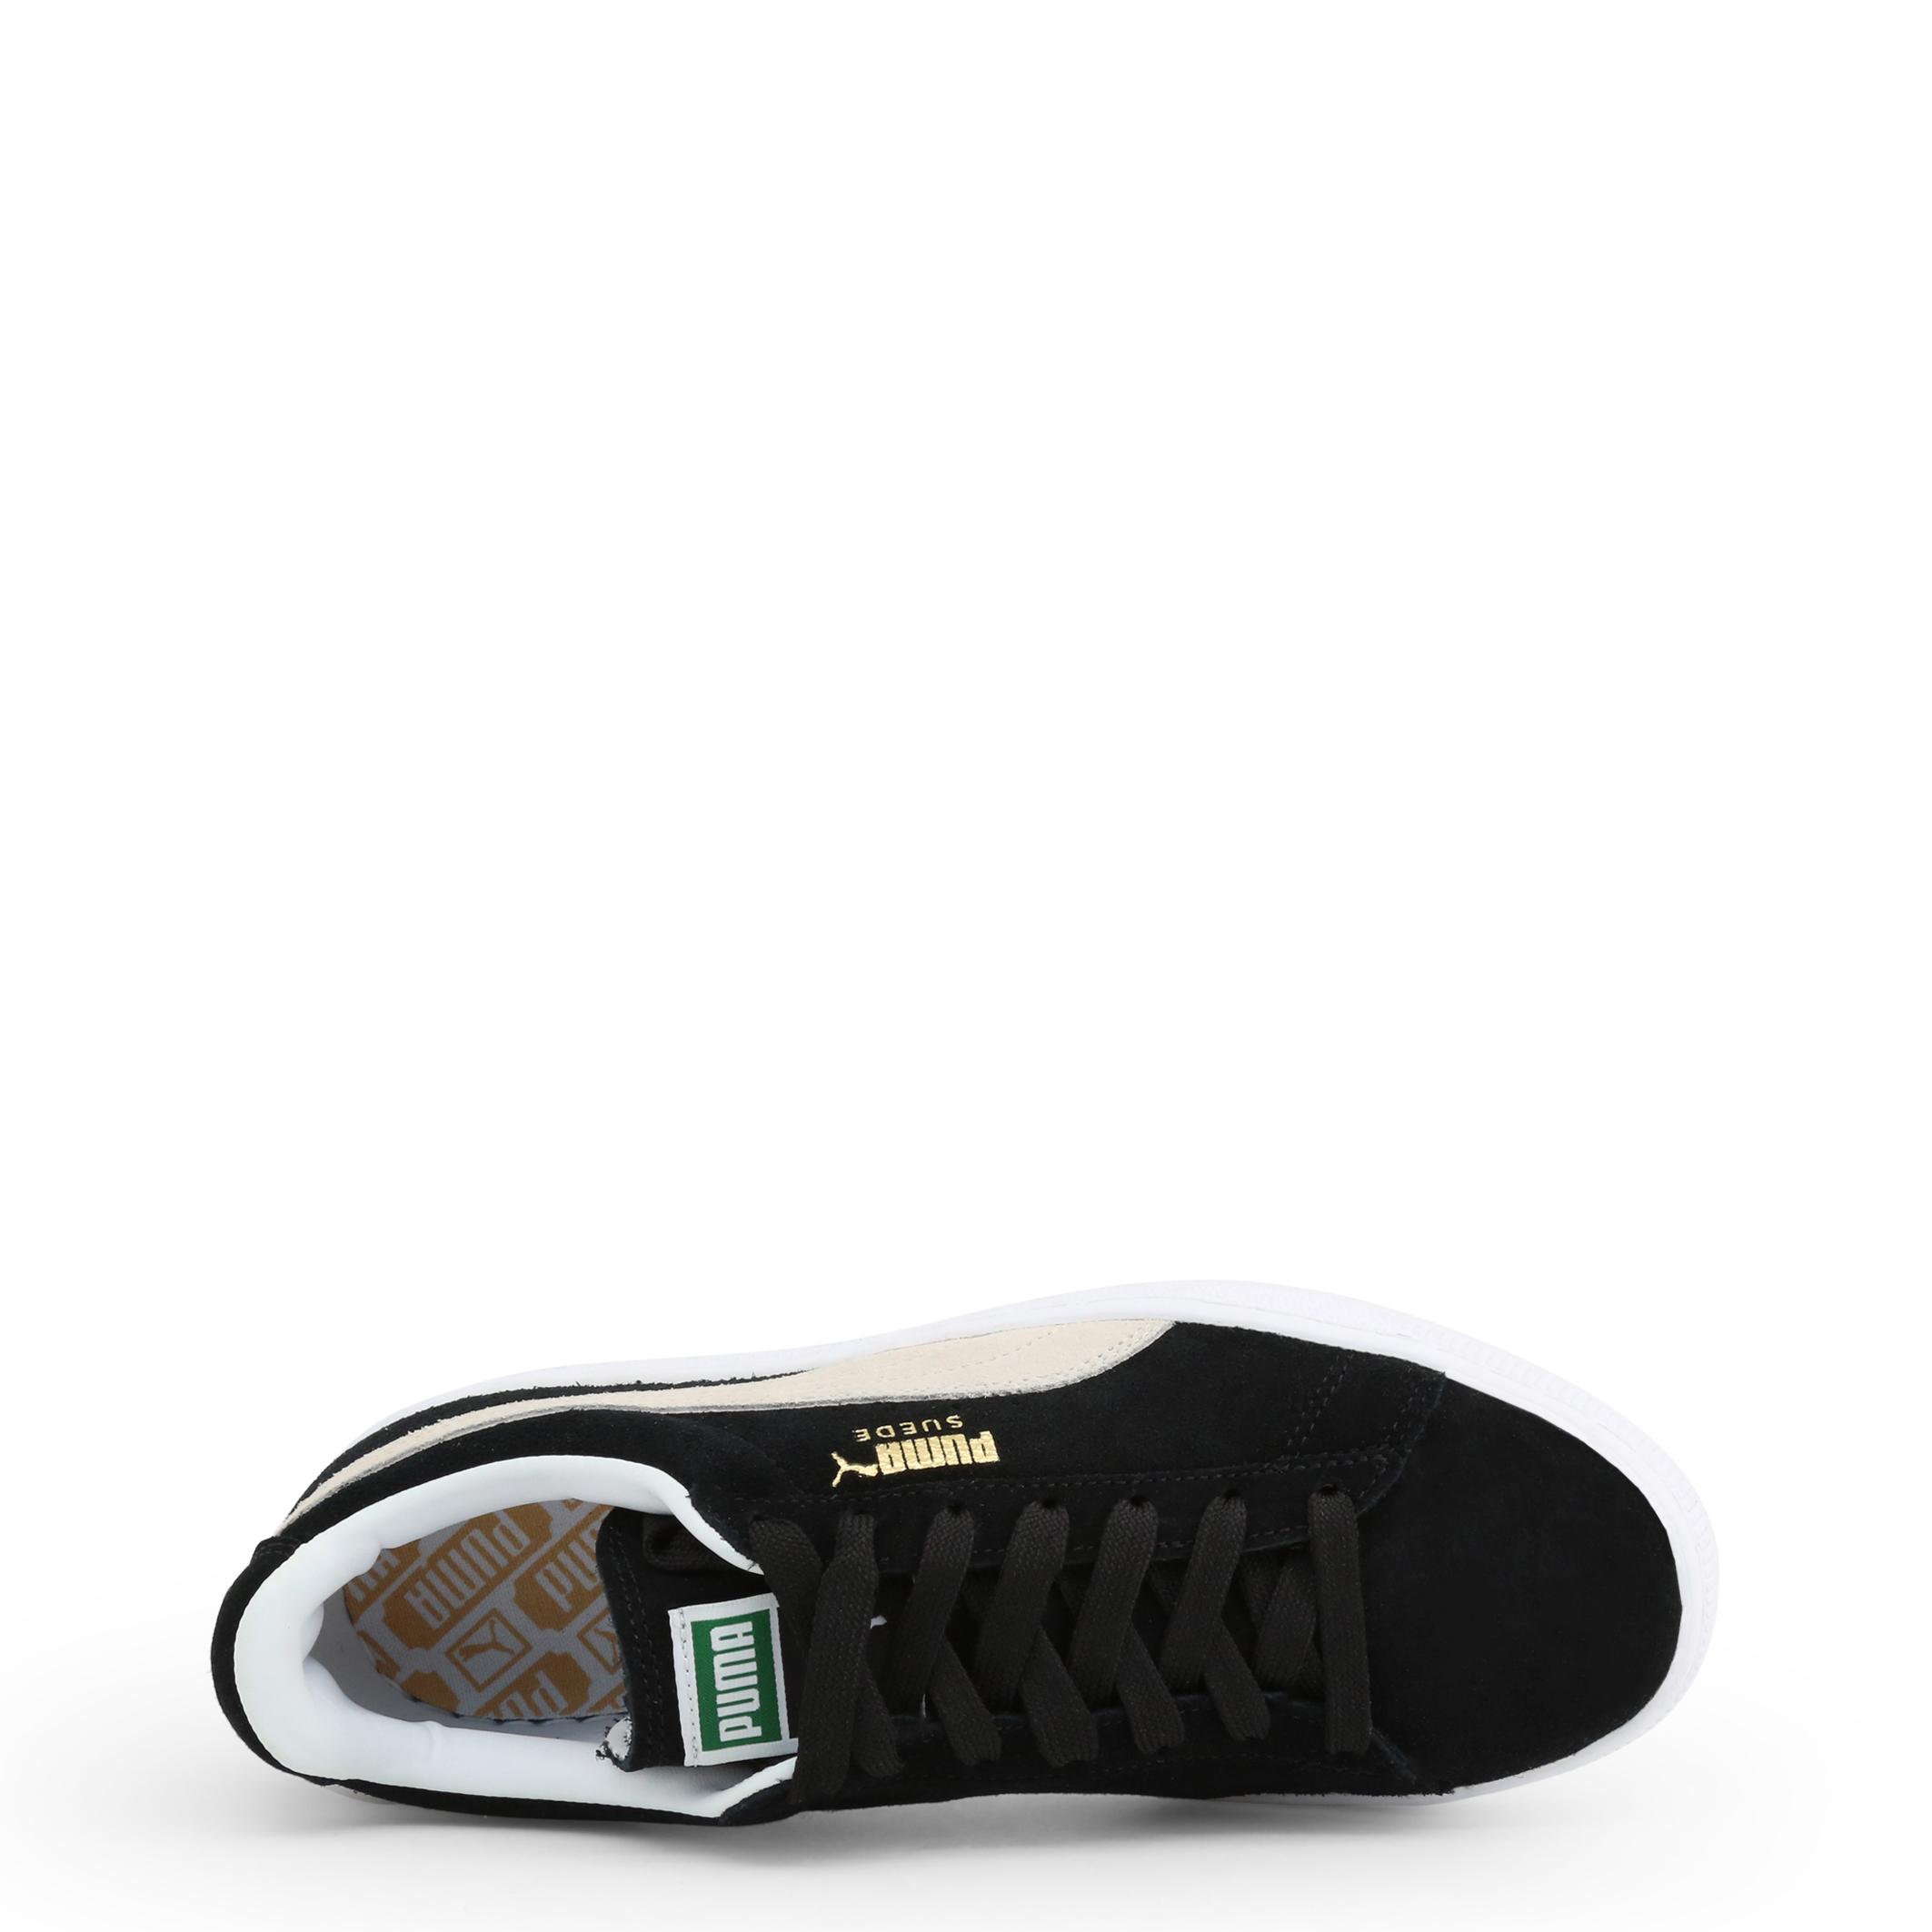 Baskets / Sport  Puma 927315-03_SuedeClassic black